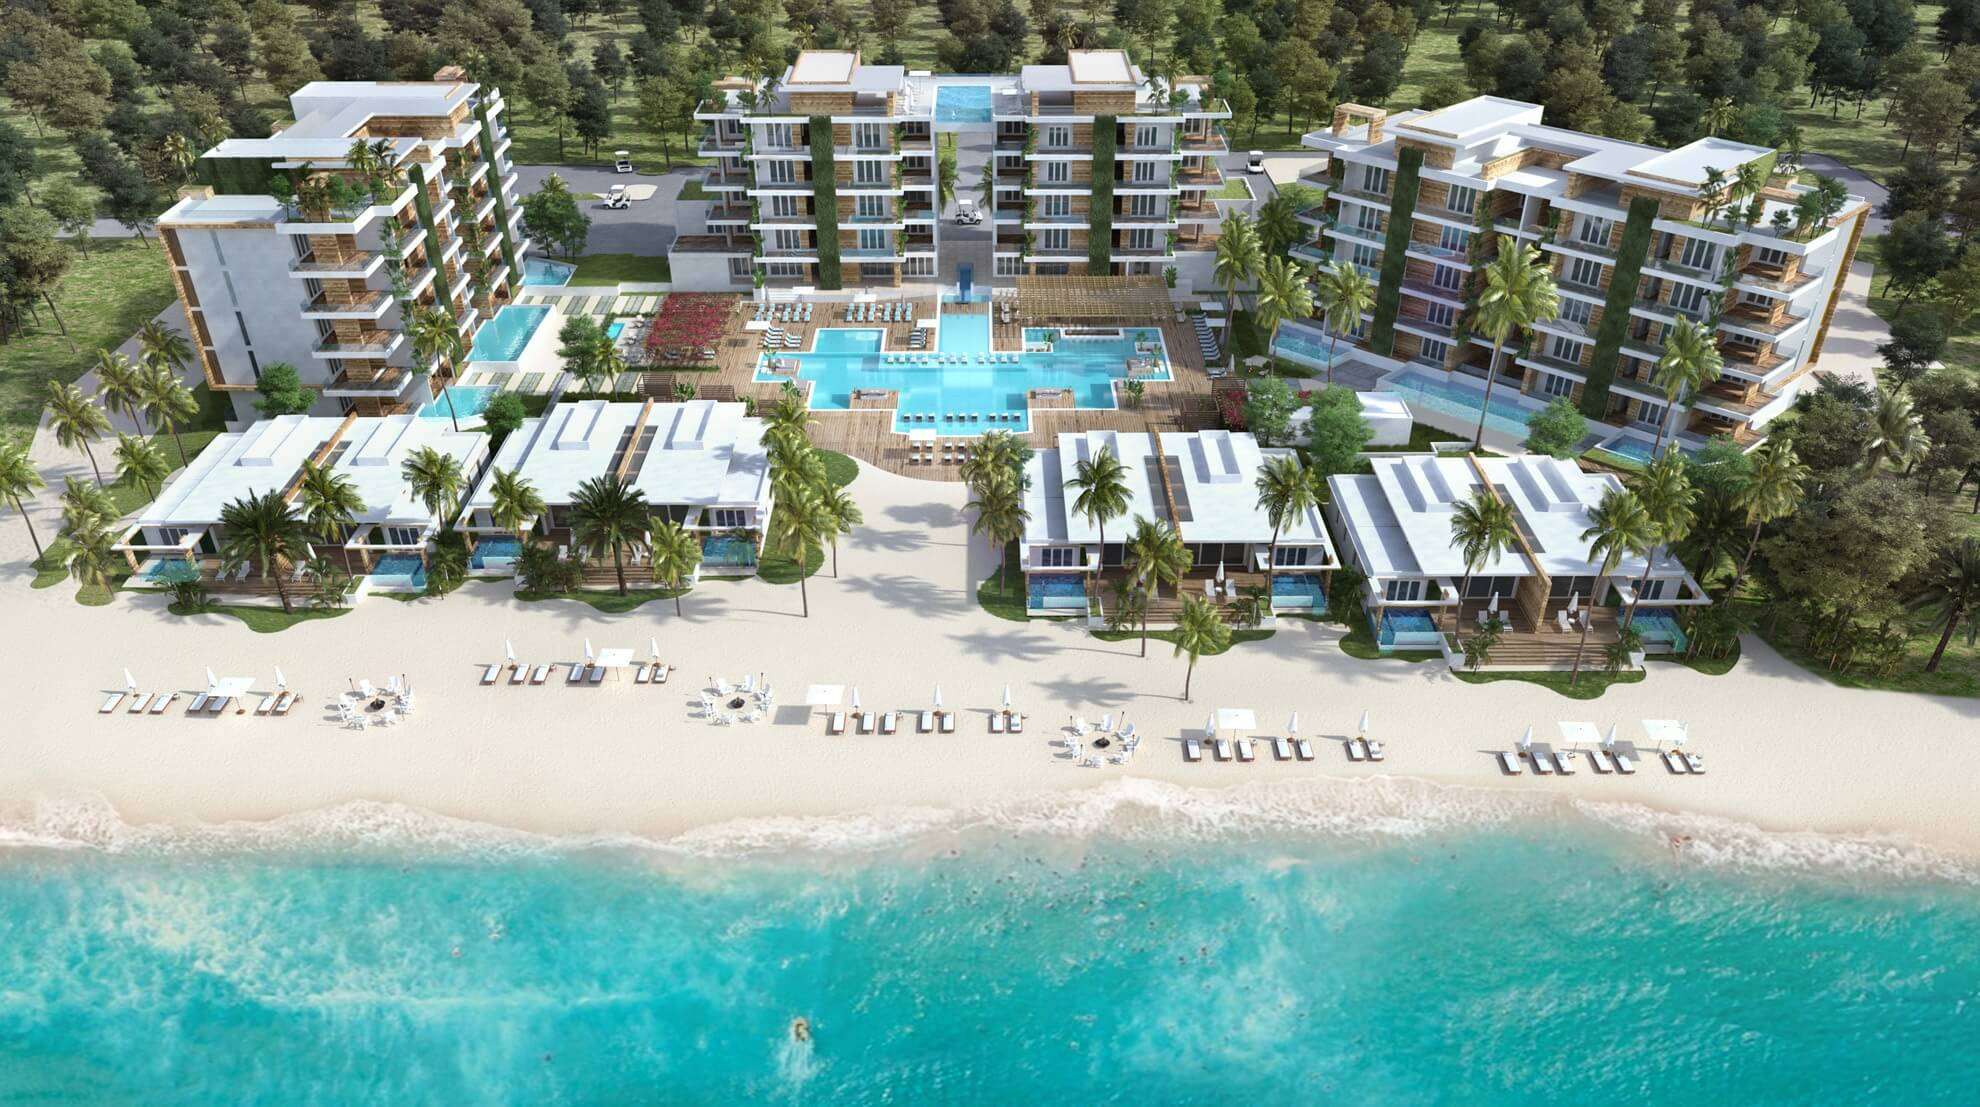 Alaia Belize hotel